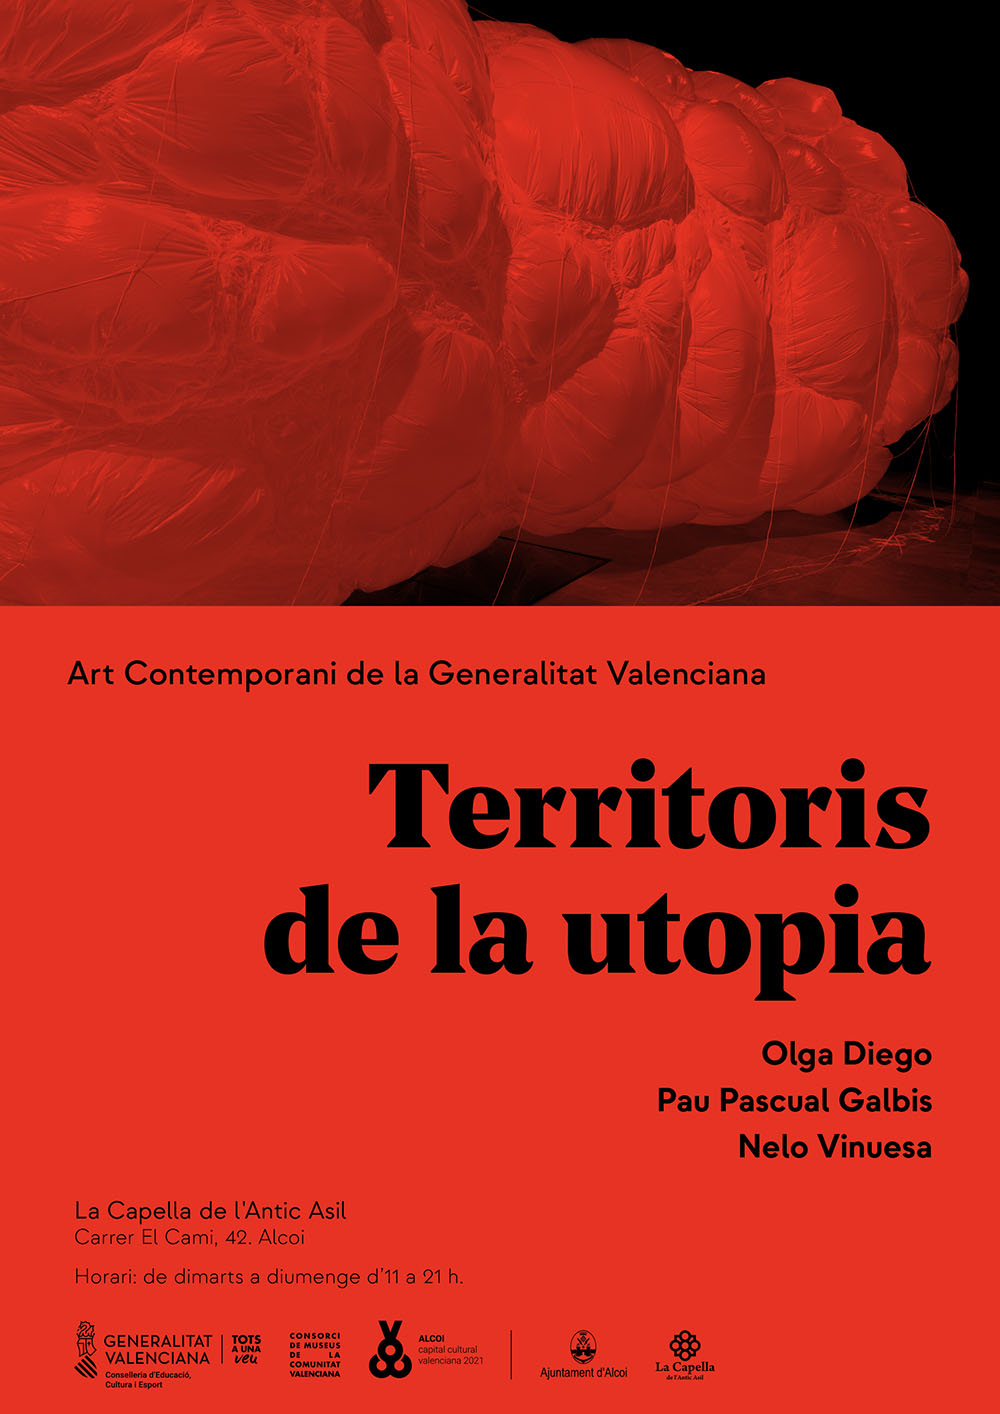 Territoris de la utopia